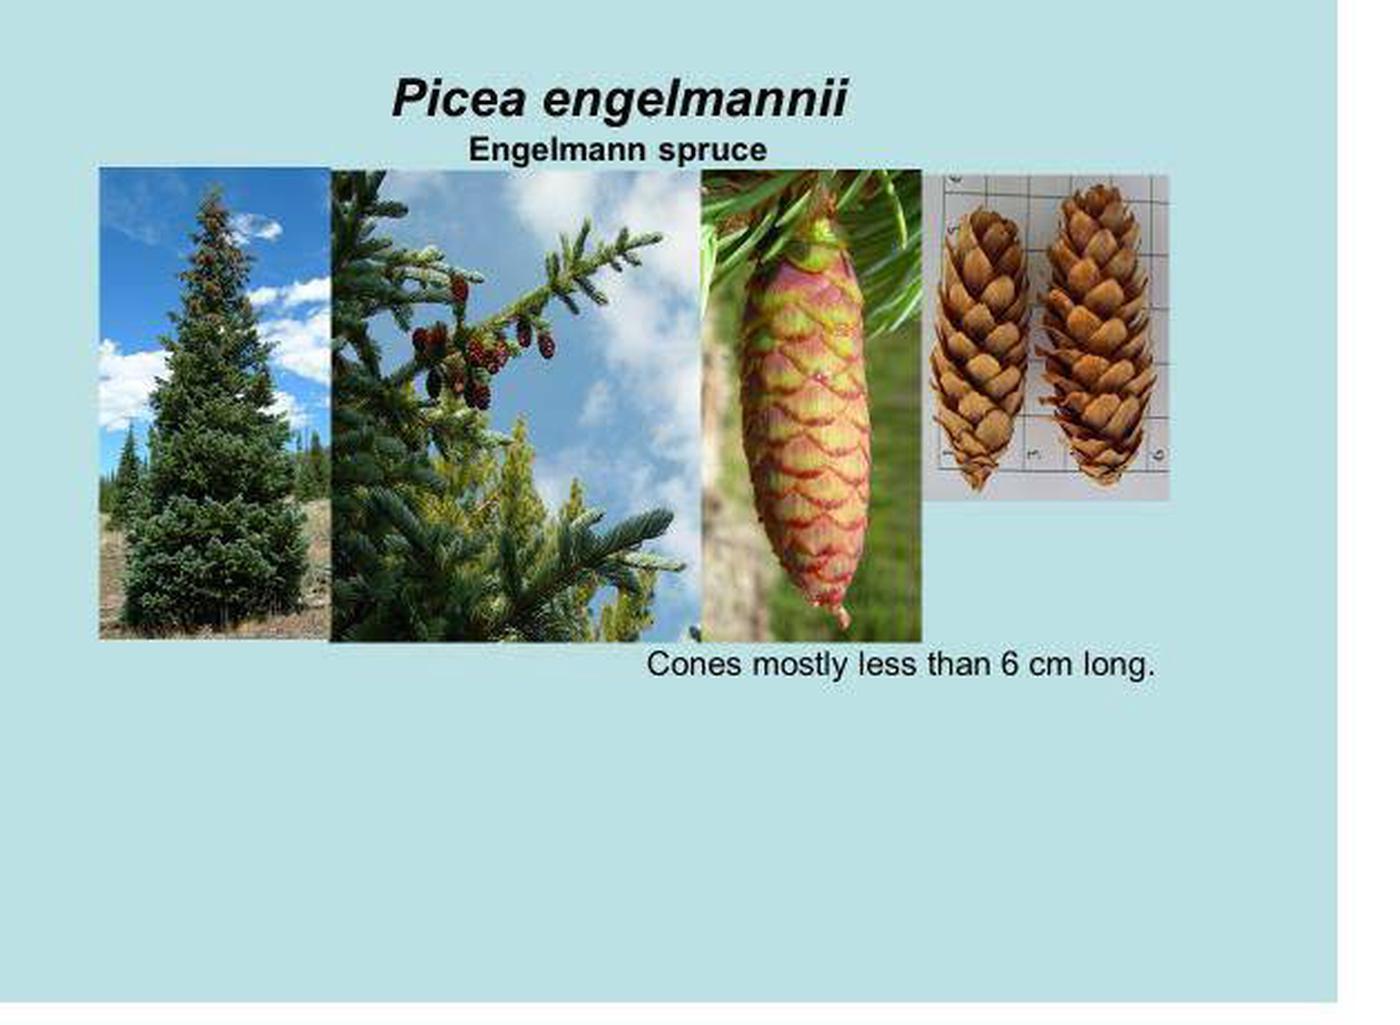 Engelmann spruce id.